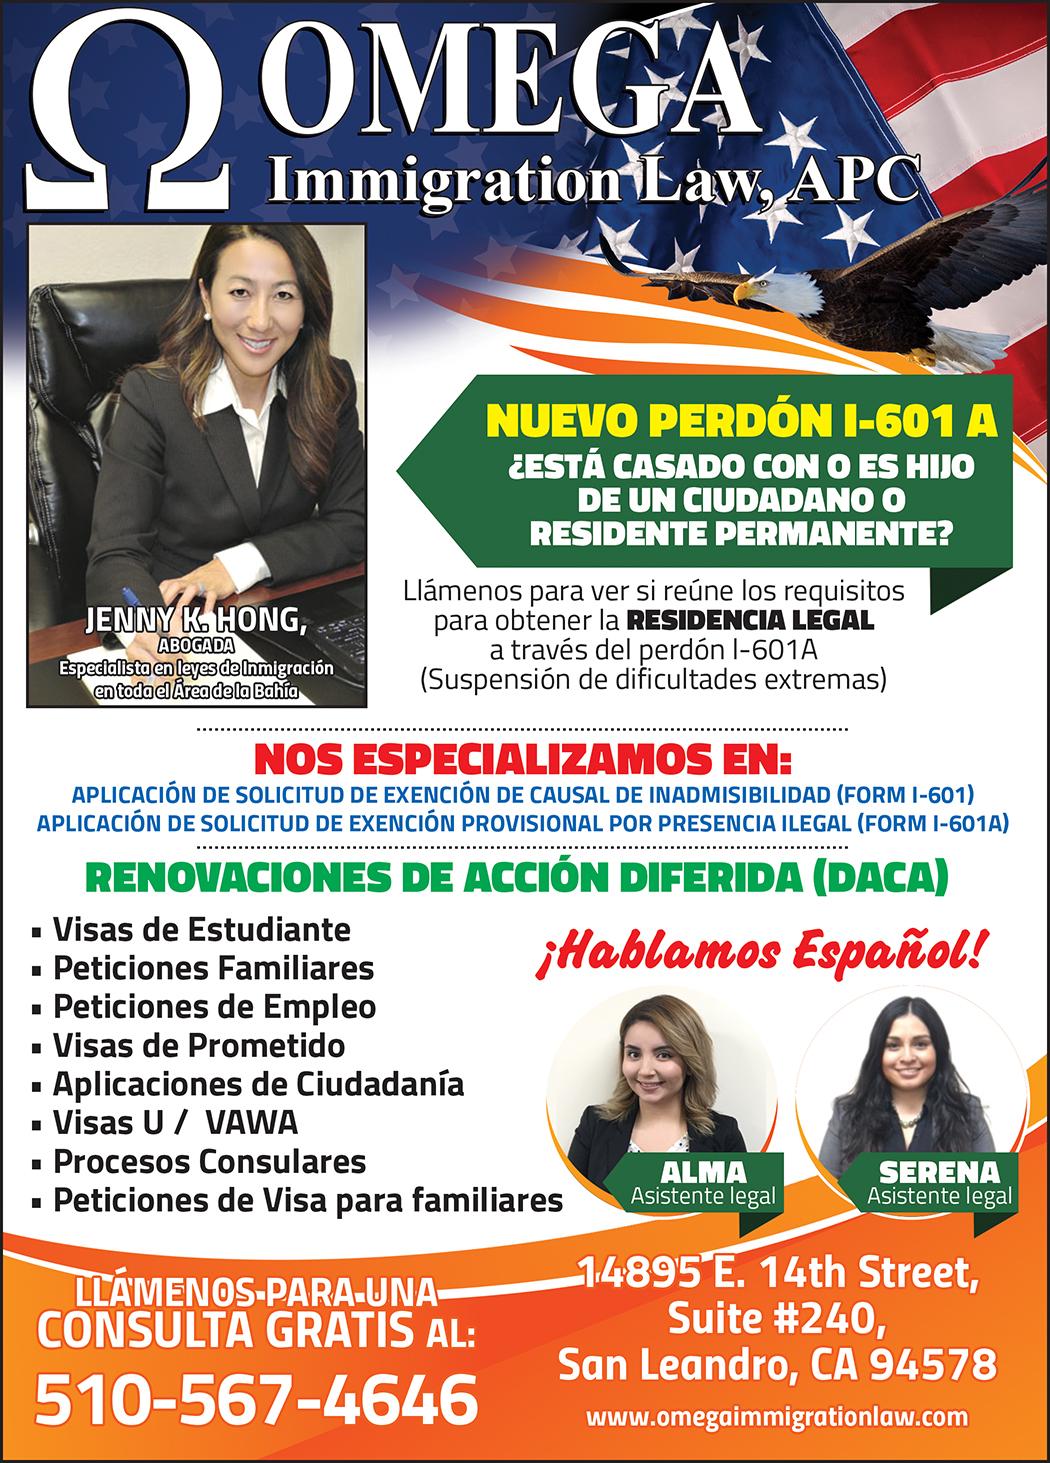 Omega Immigration Law APC 1 pag Agosto 2018 copy.jpg